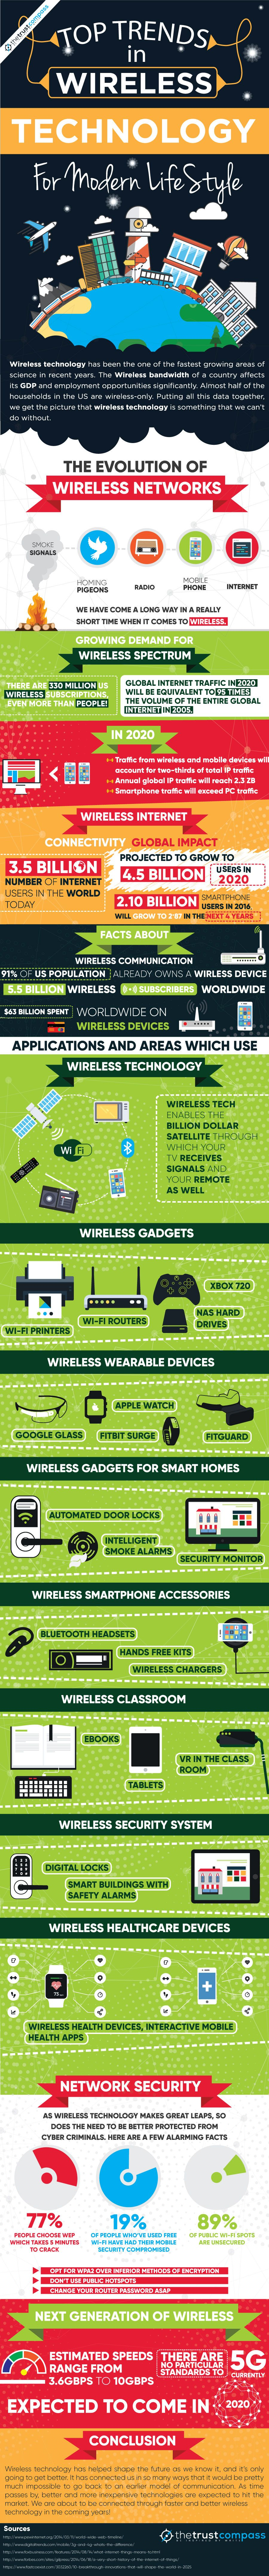 Trends Wireless info